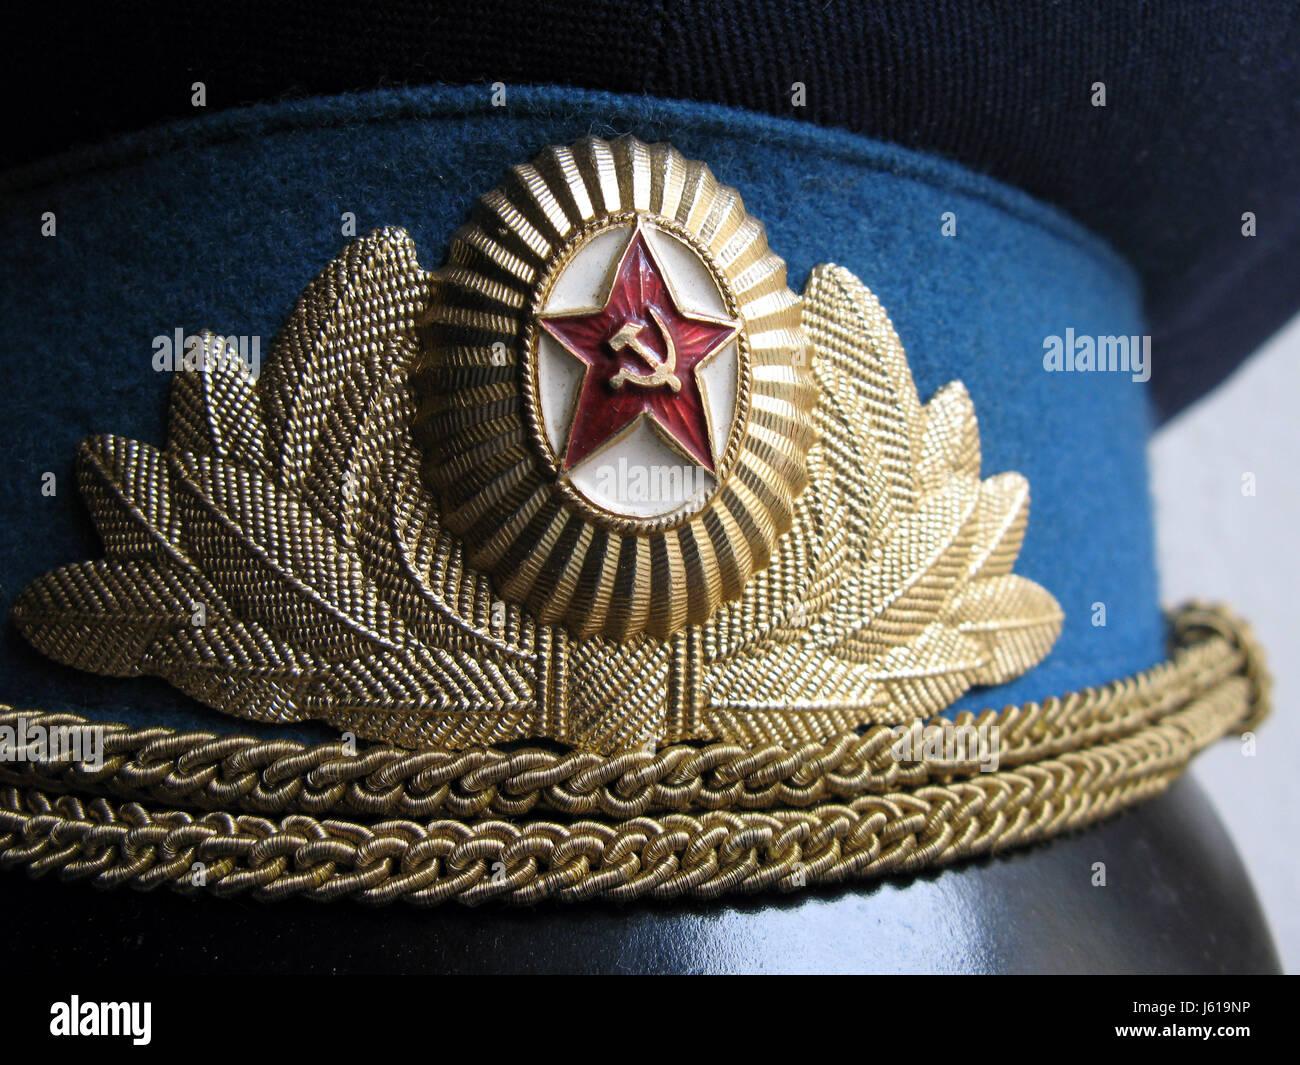 detail uniform cap russian emblem detail uniform cap russian emblem uniformteil - Stock Image